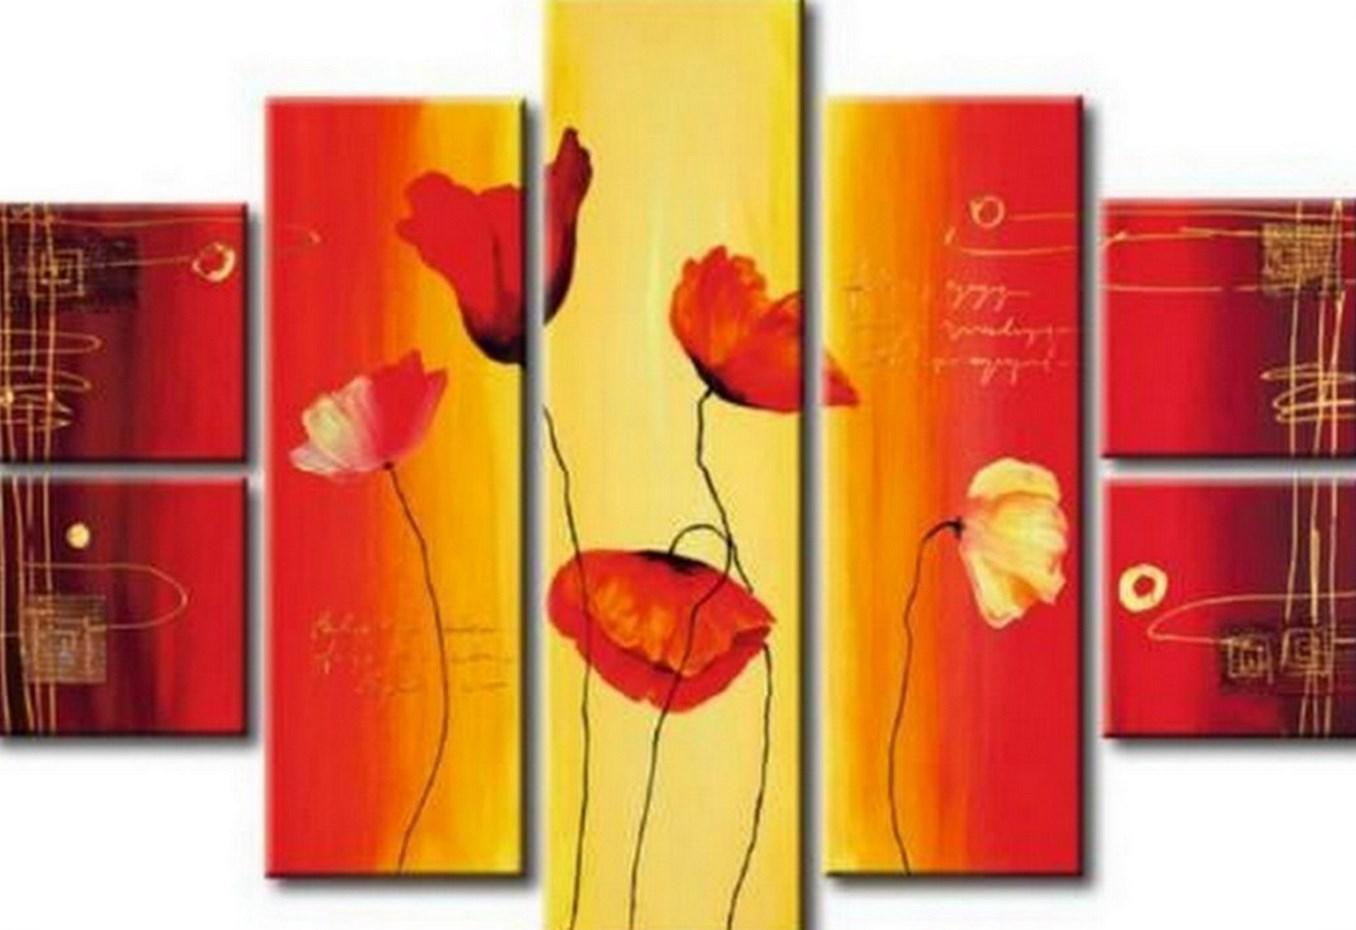 Im genes arte pinturas cuadros abstractos modernos - Cuadros con relieve modernos ...